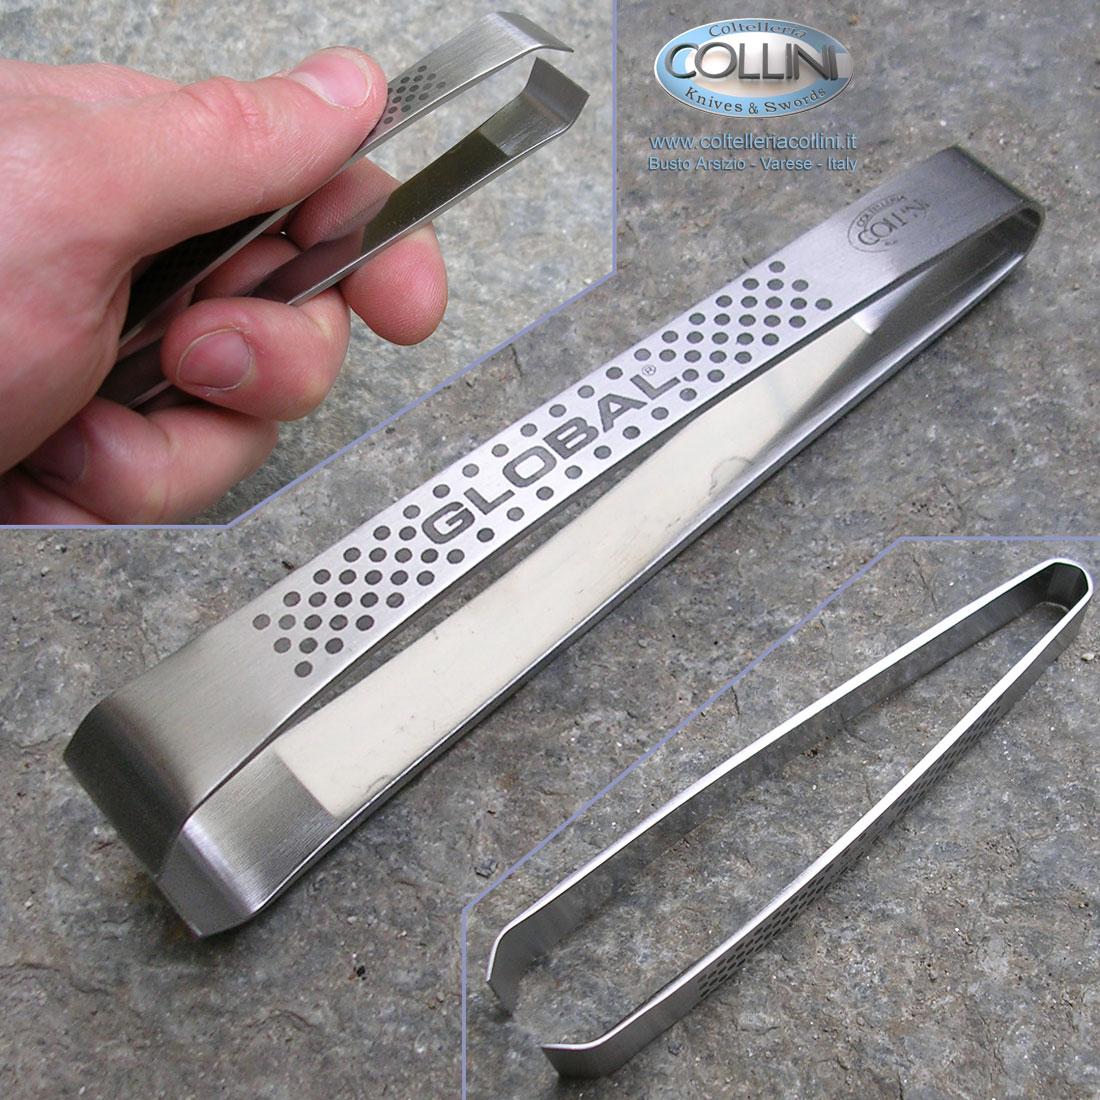 Global gs20b fish bone tweezers kitchen knife for Fish bone tweezers